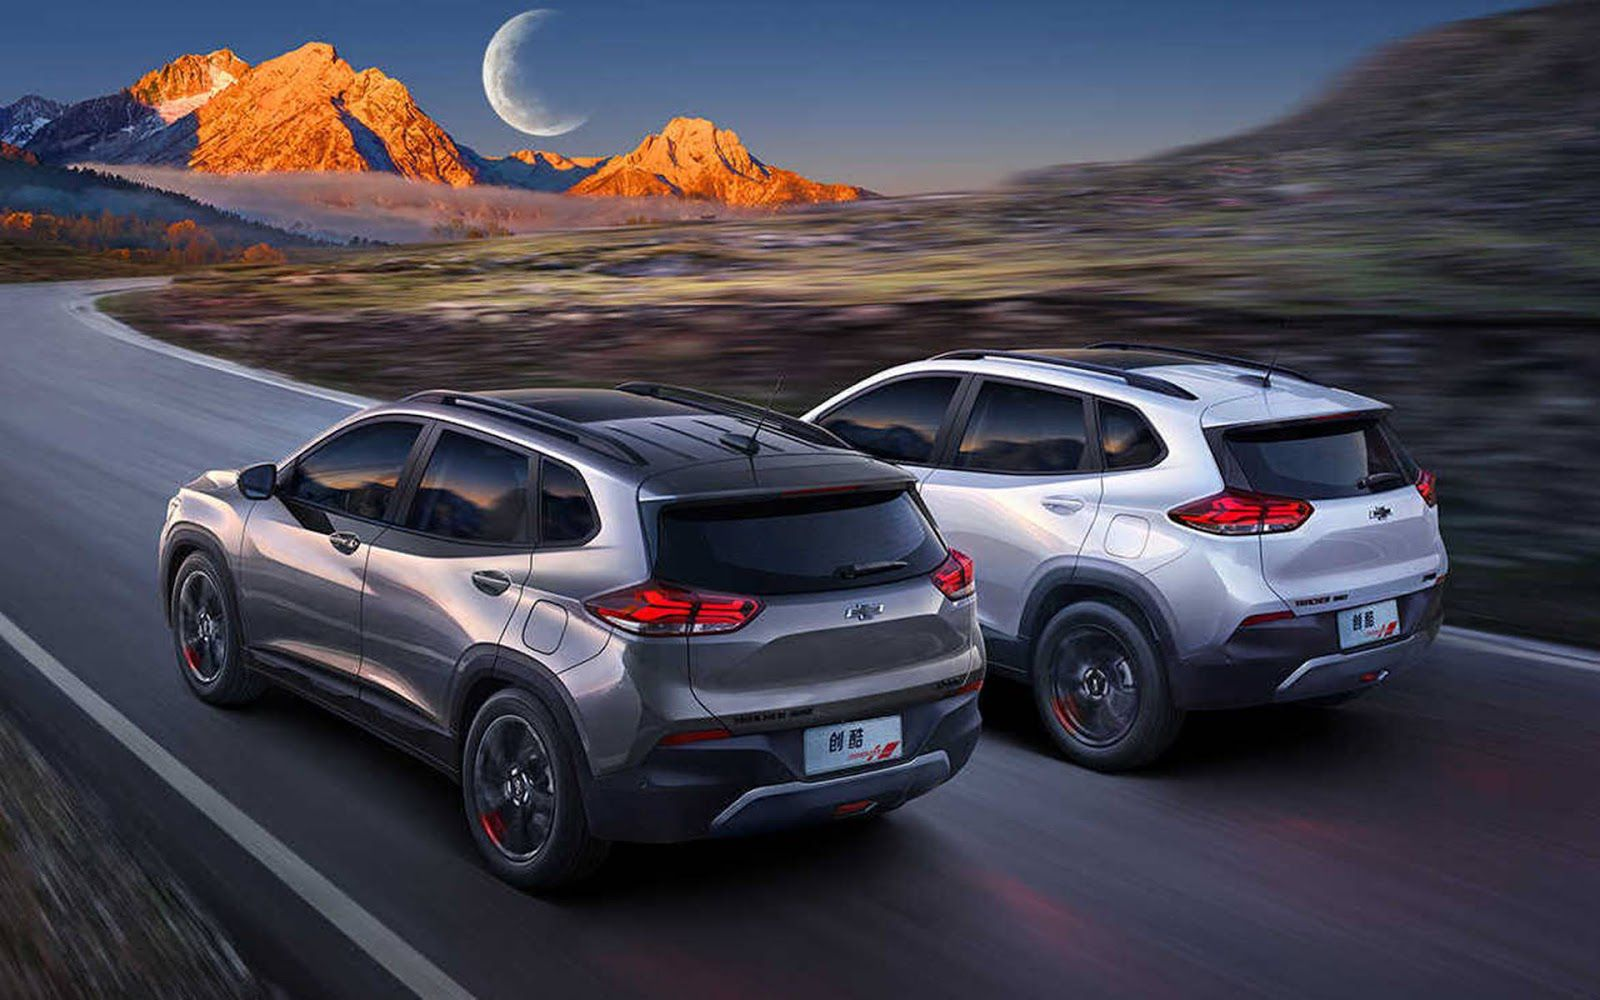 Envelopamento de Teto Chevrolet Tracker  - Completo  Colunas e Aerofólio - Black Piano / fosco